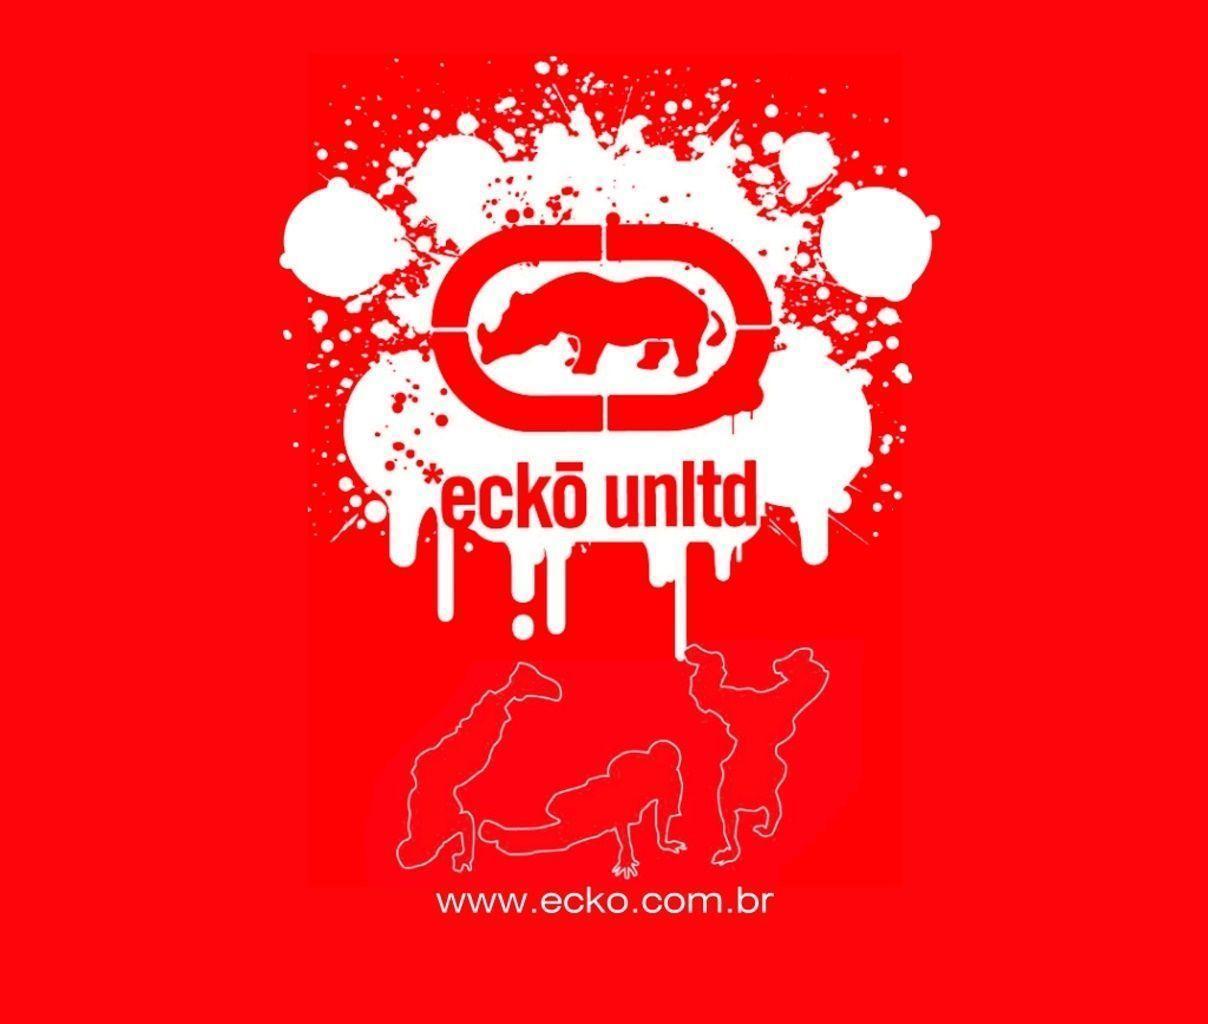 Google themes ecko - Ecko Break Dancing Google Skins Ecko Break Dancing Google